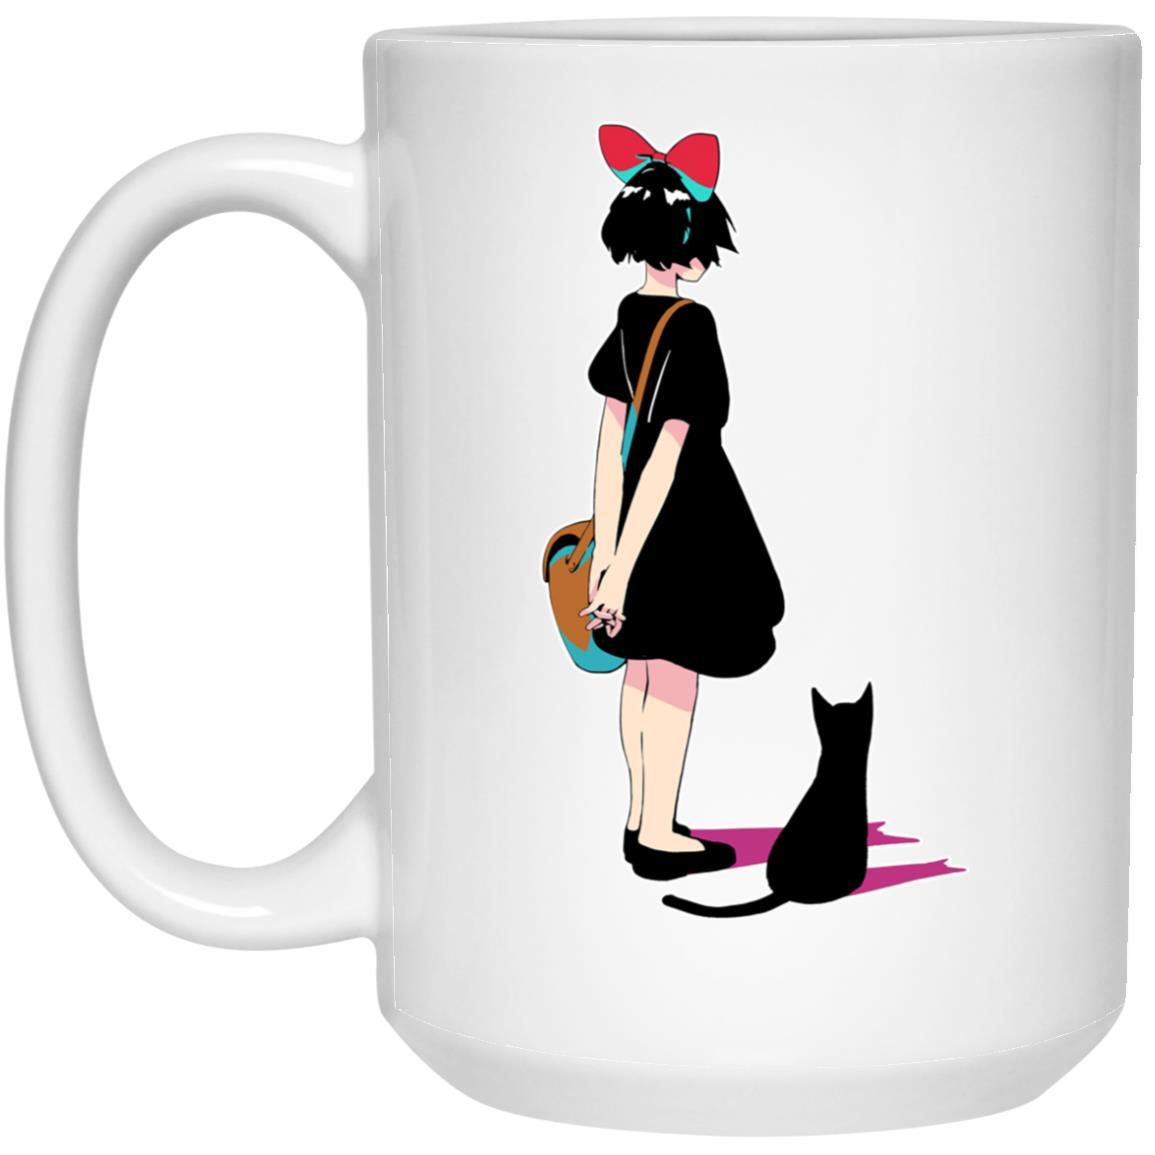 Kiki and Jiji Color Art Mug